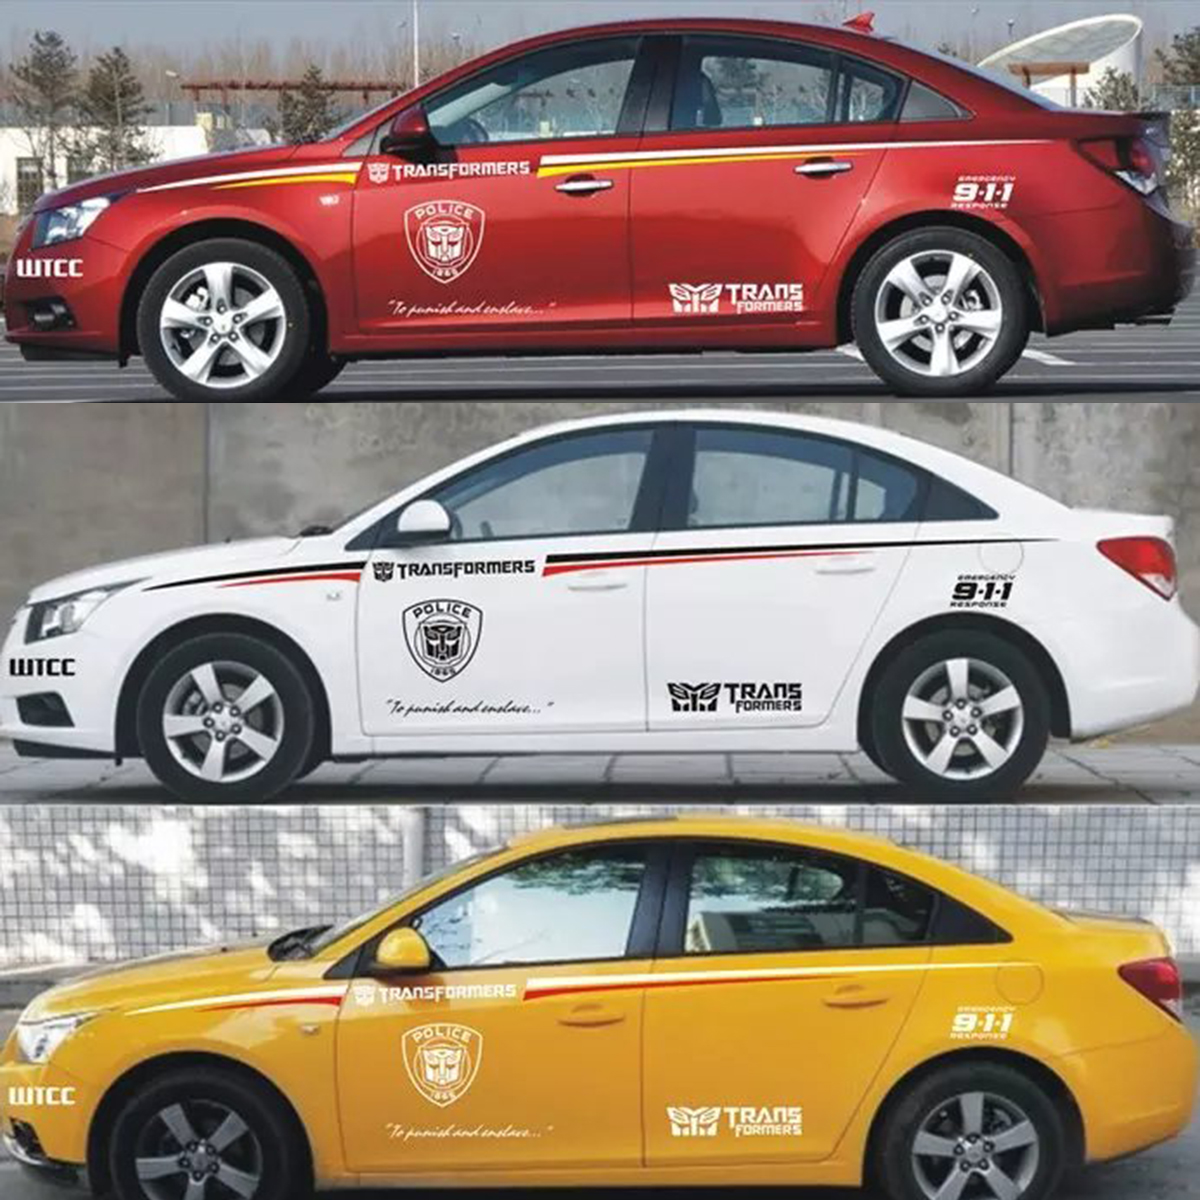 Car sticker design philippines - Car Modification Waist Body Paste Modified Us Version 911 Police Transformers Hornet Waist Body Garland Decorative